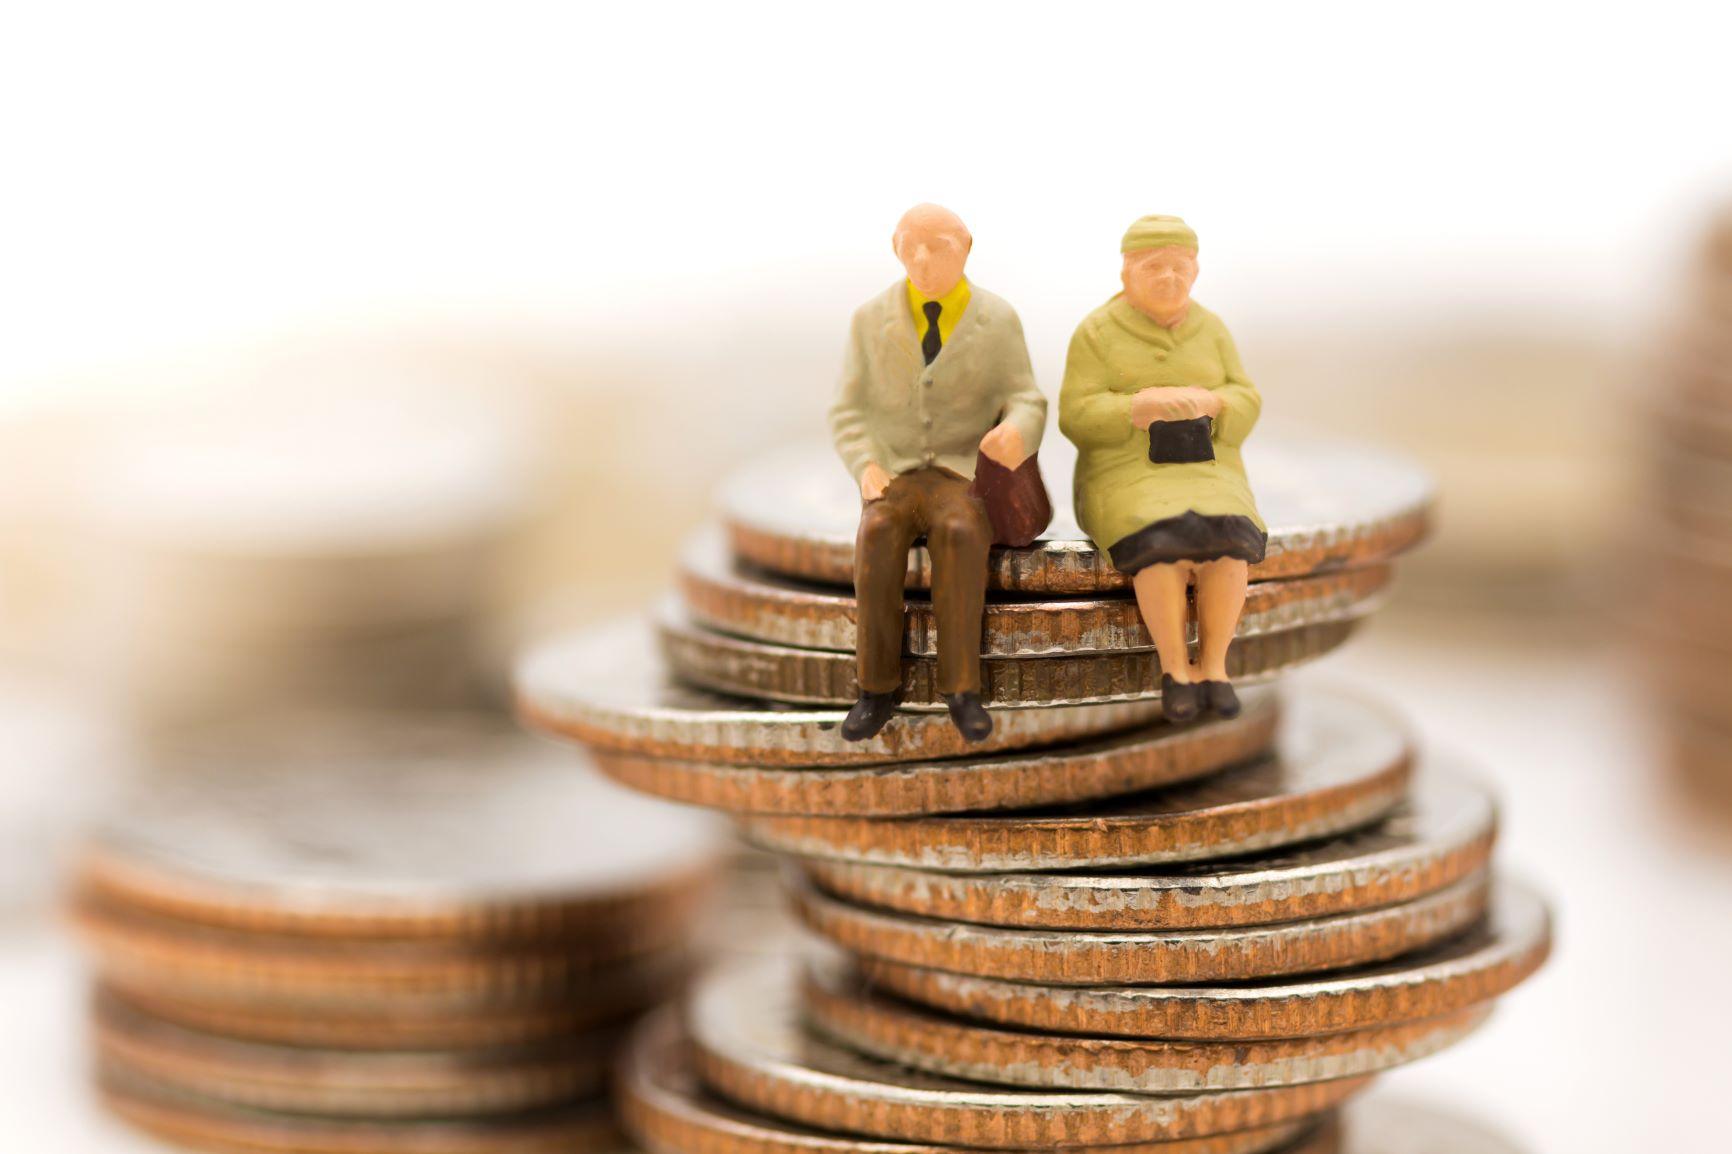 Ako investova jednoducho, rozumne a lacno - Peniaze